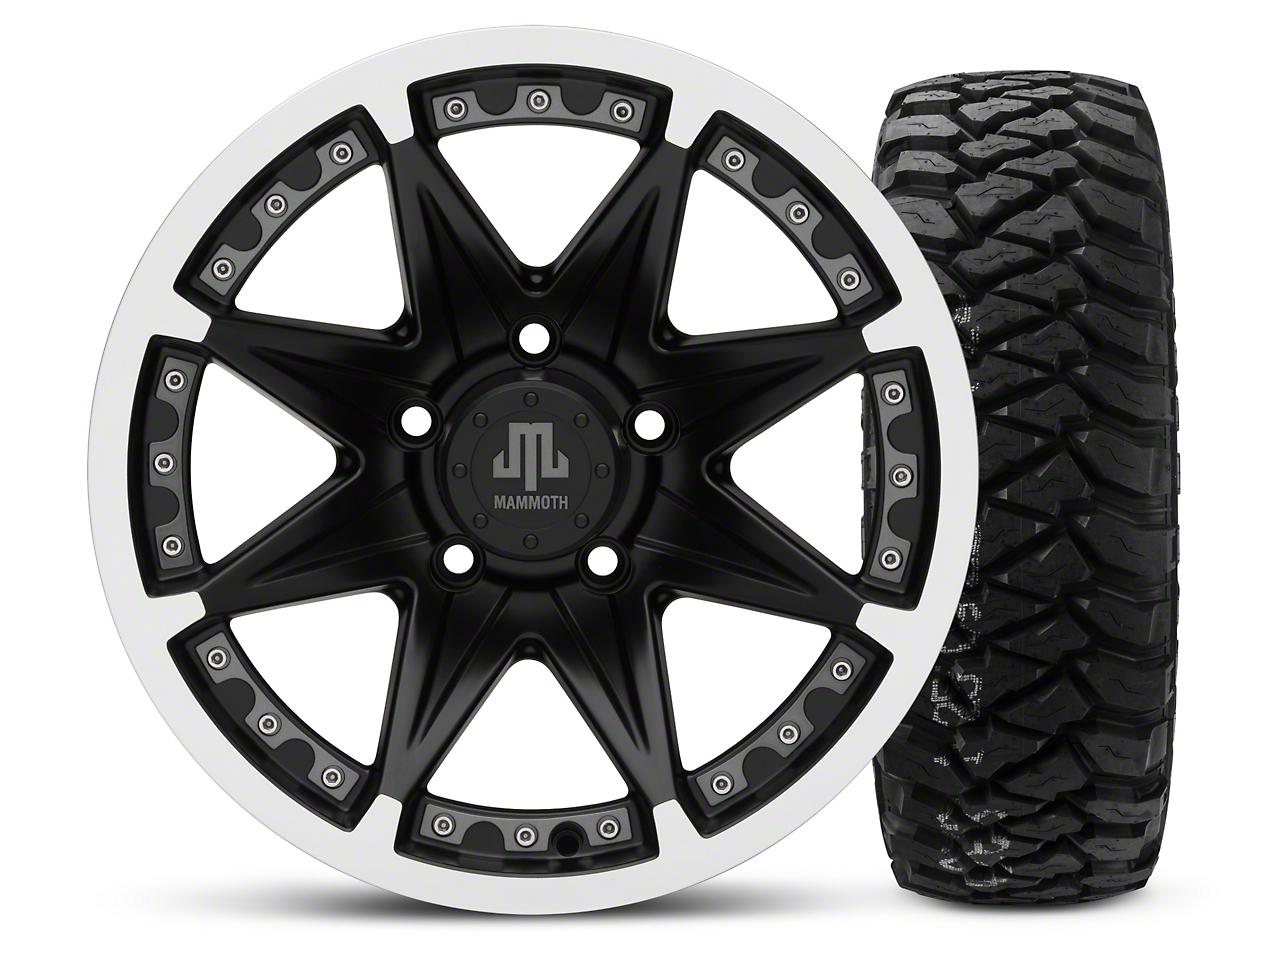 Mammoth Type 88 Black - 16x8 Wheel - and Mickey Thompson Baja MTZP3 Tire - 285/75R16 (07-18 Jeep Wrangler JK; 2018 Jeep Wrangler JL)